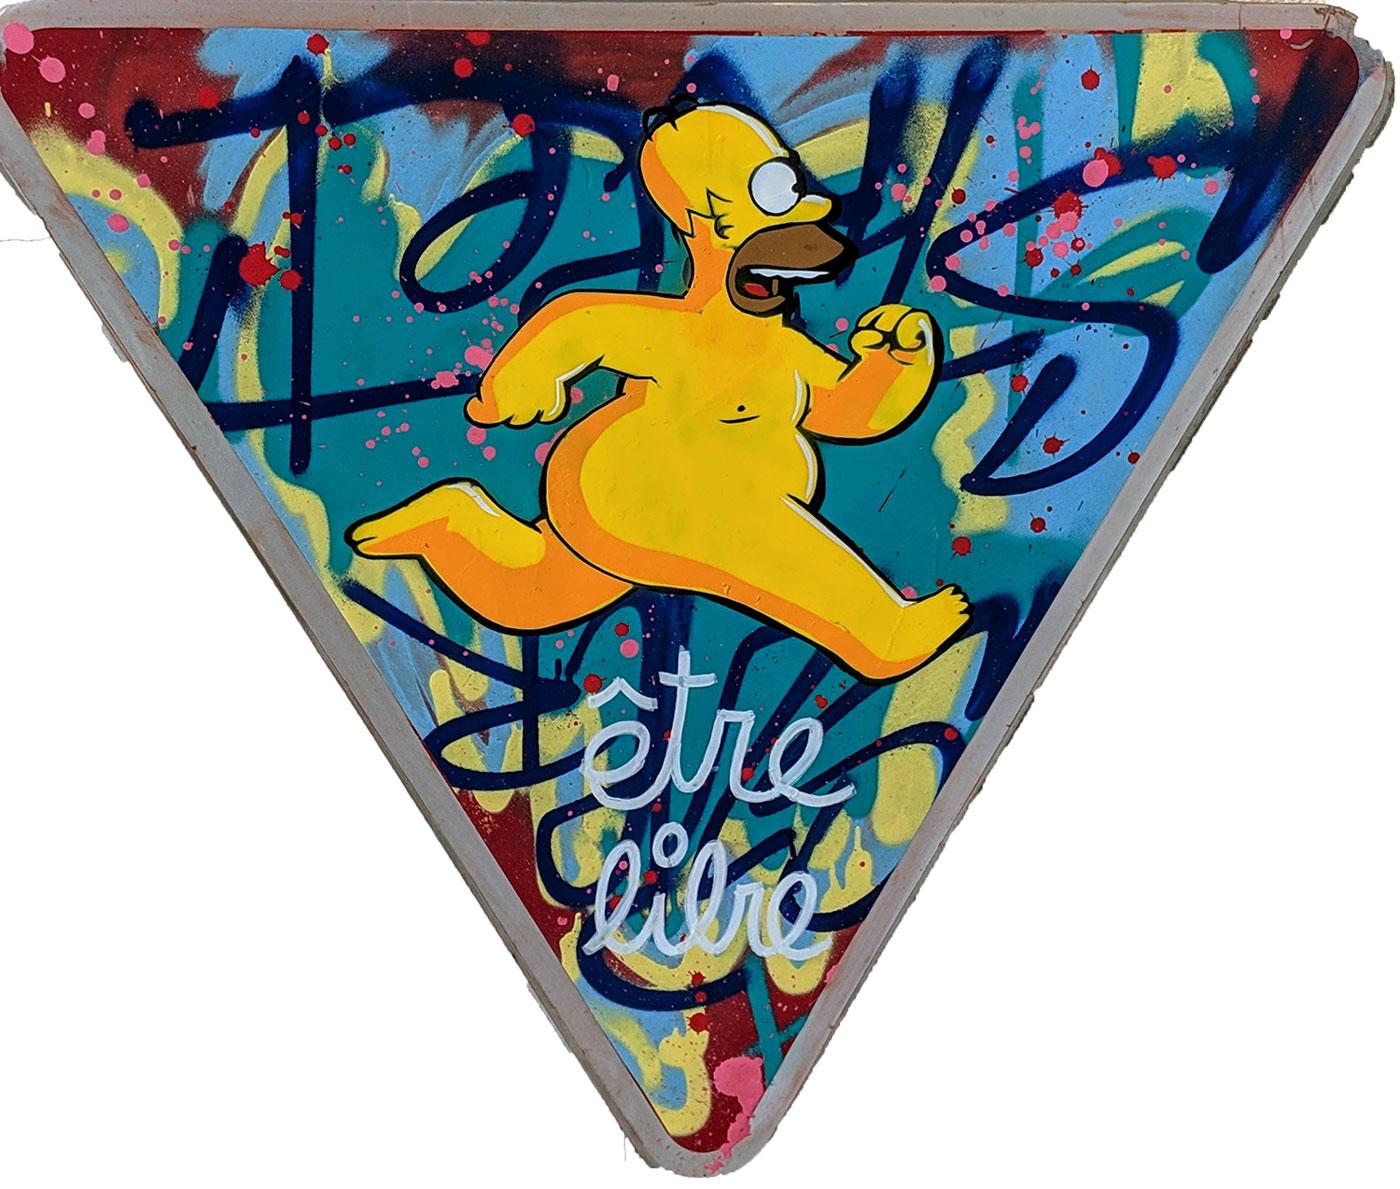 Libre-comme-l'Homer